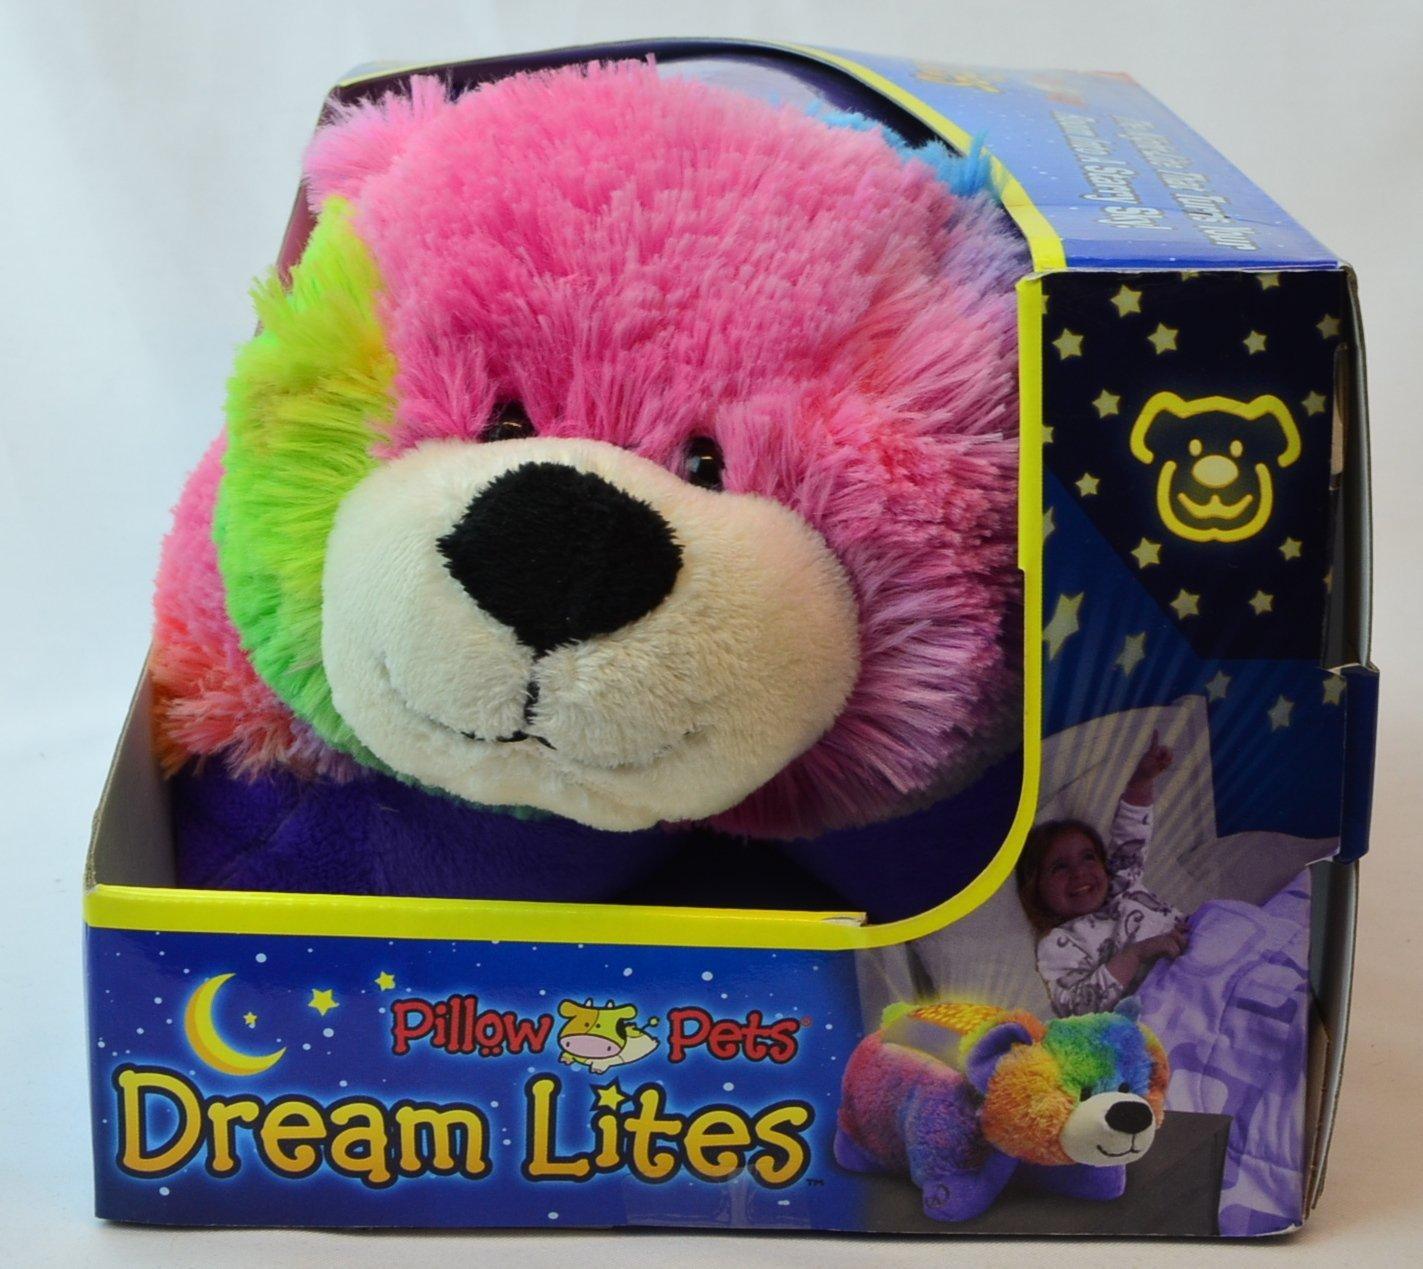 Amazon.com: Pillow Pets Dream Lites Plush Night Light - Peace Bear ...:Amazon.com: Pillow Pets Dream Lites Plush Night Light - Peace Bear 11